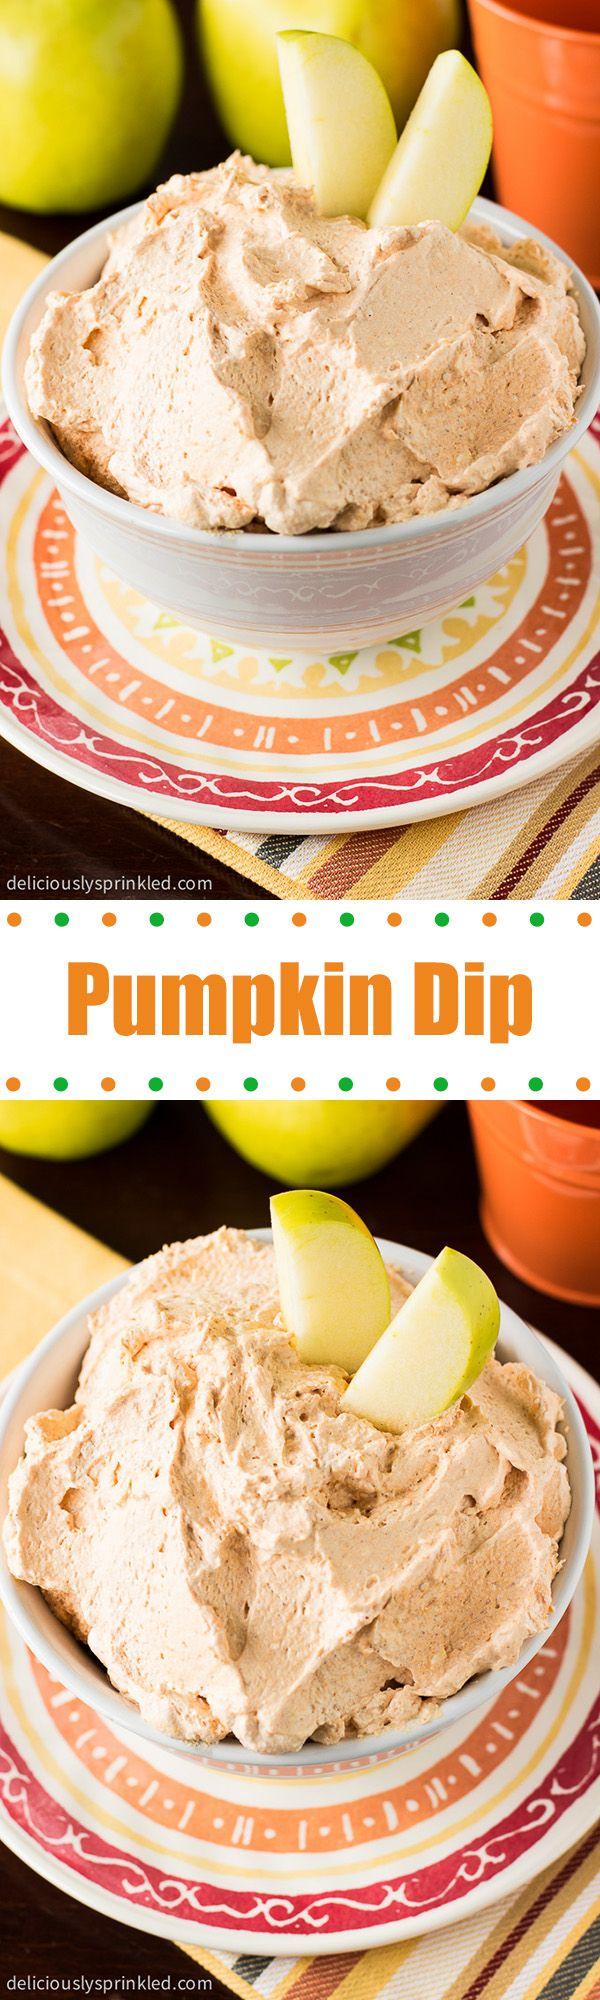 Pumpkin Dip- a super easy pumpkin dip, perfect for dipping fruit!